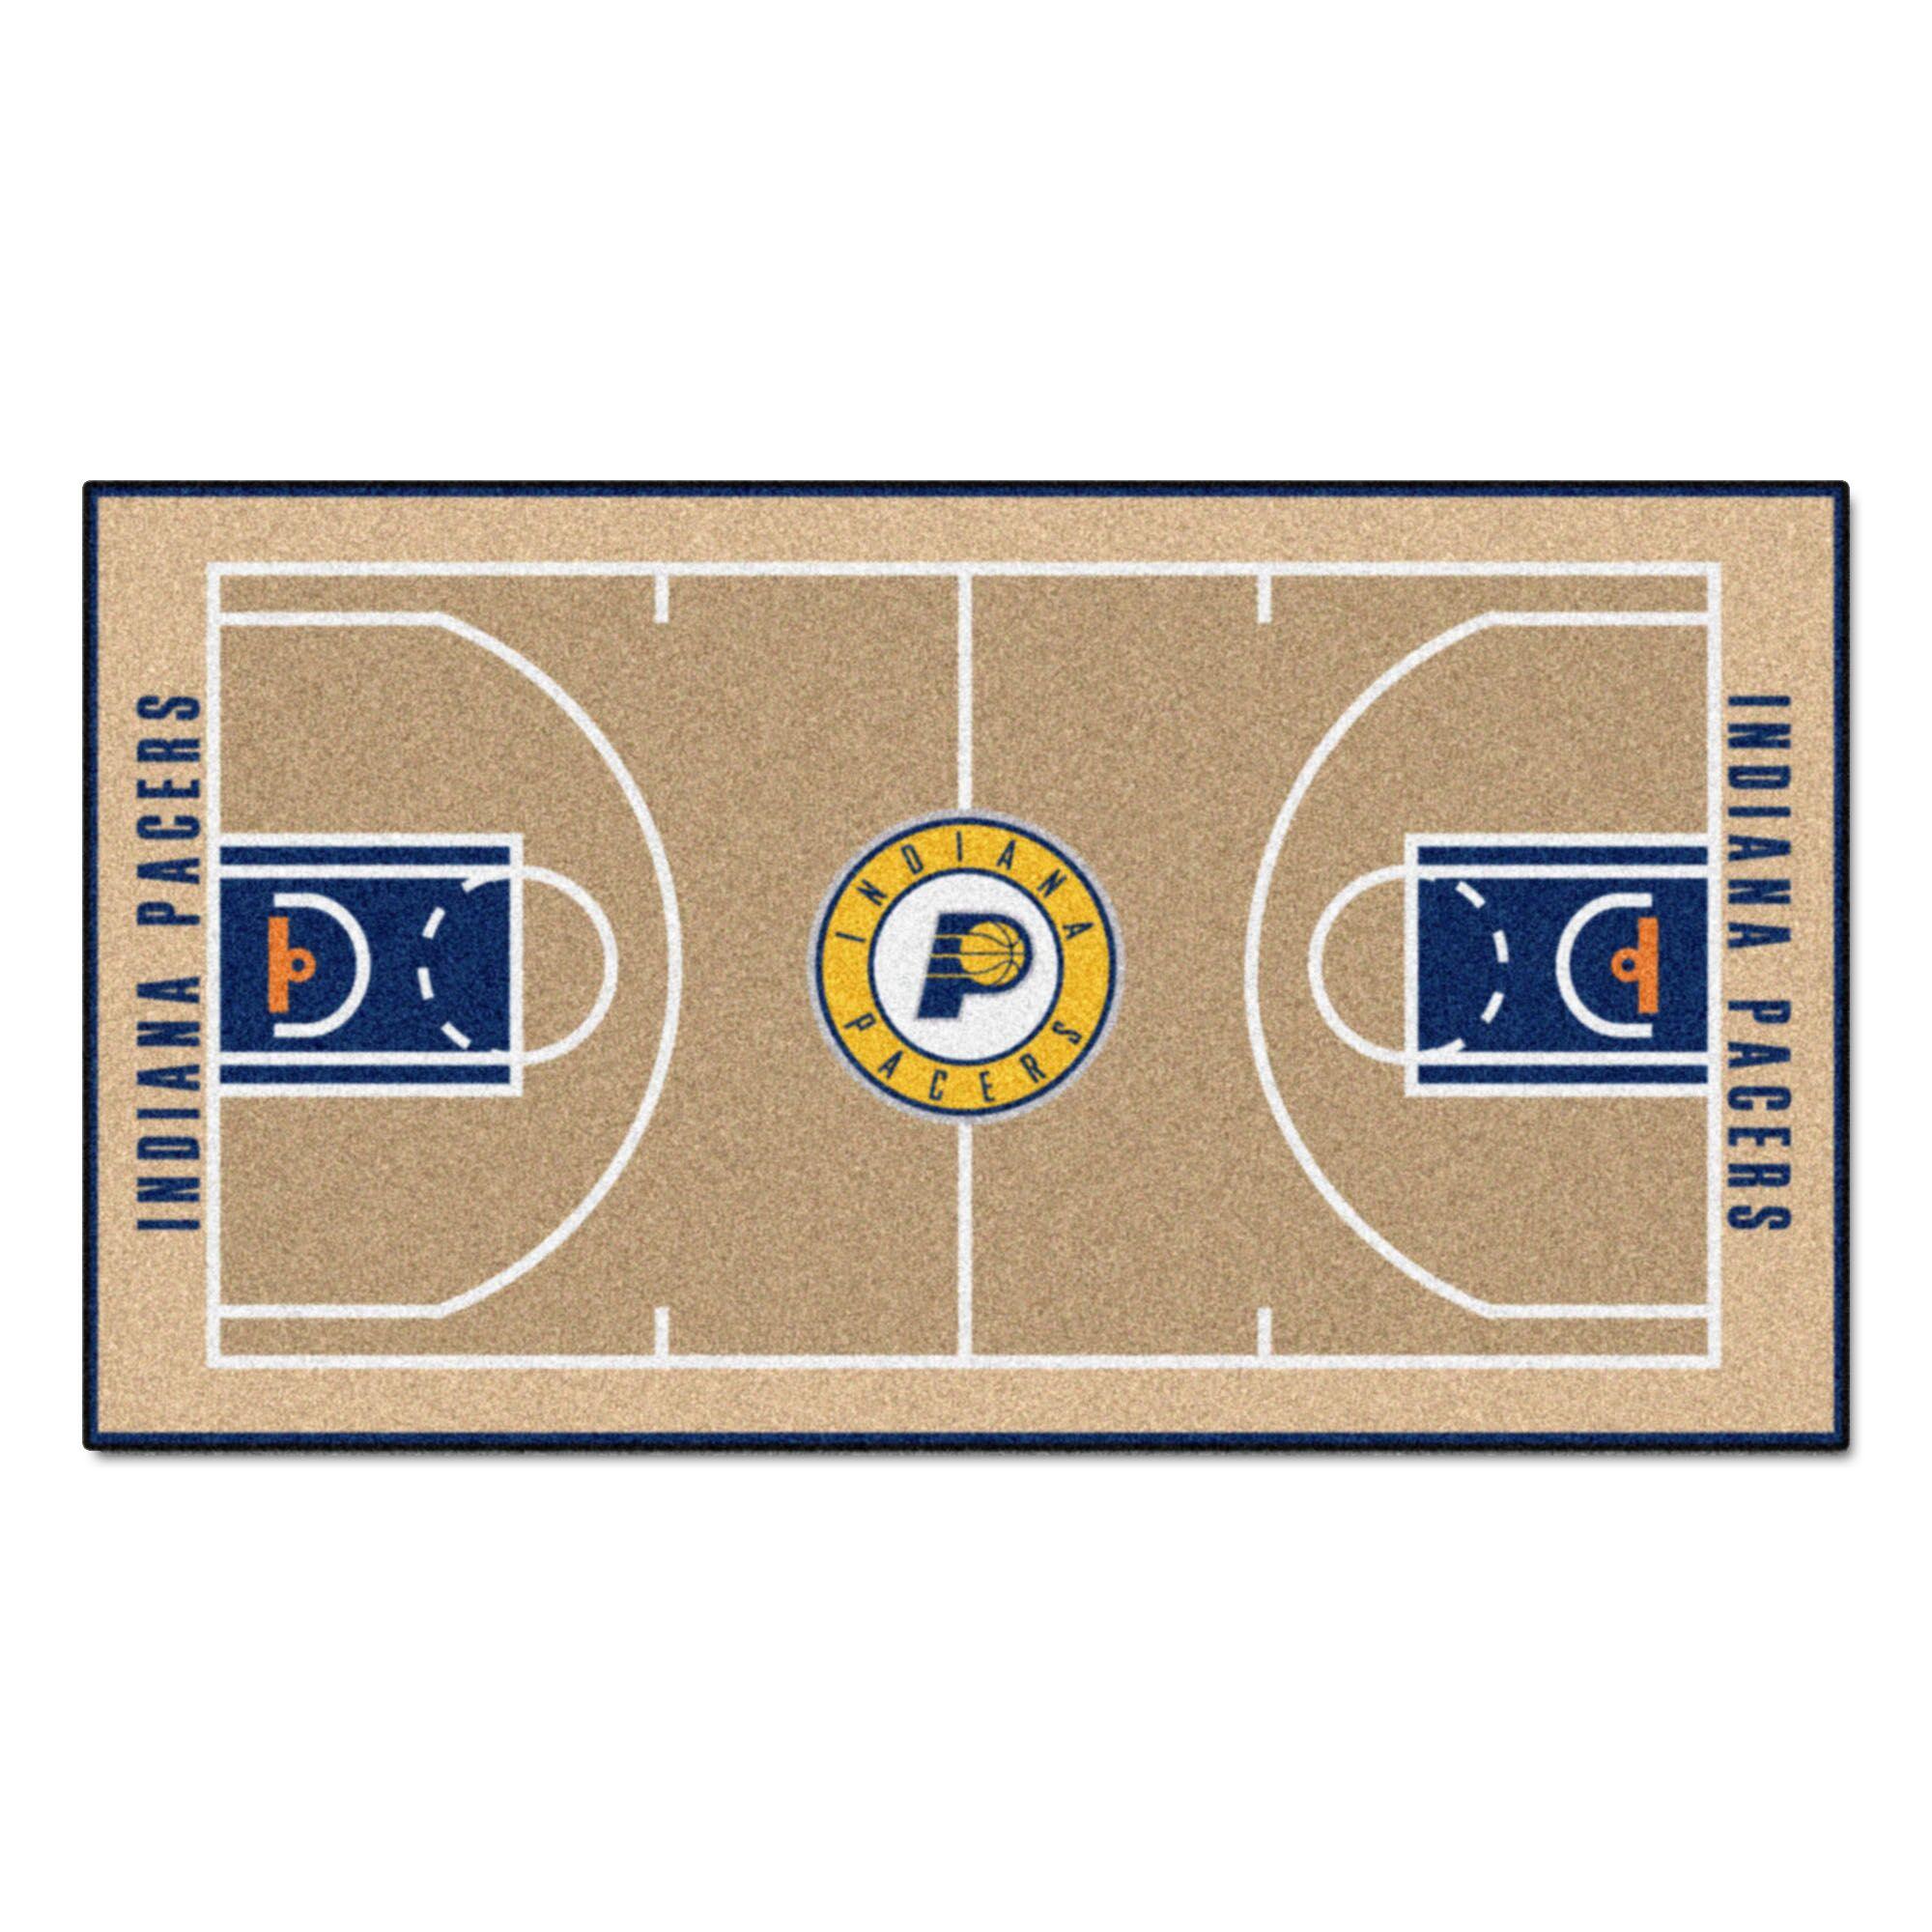 NBA - Indiana Pacers NBA Court Runner Doormat Mat Size: 2' x 3'8